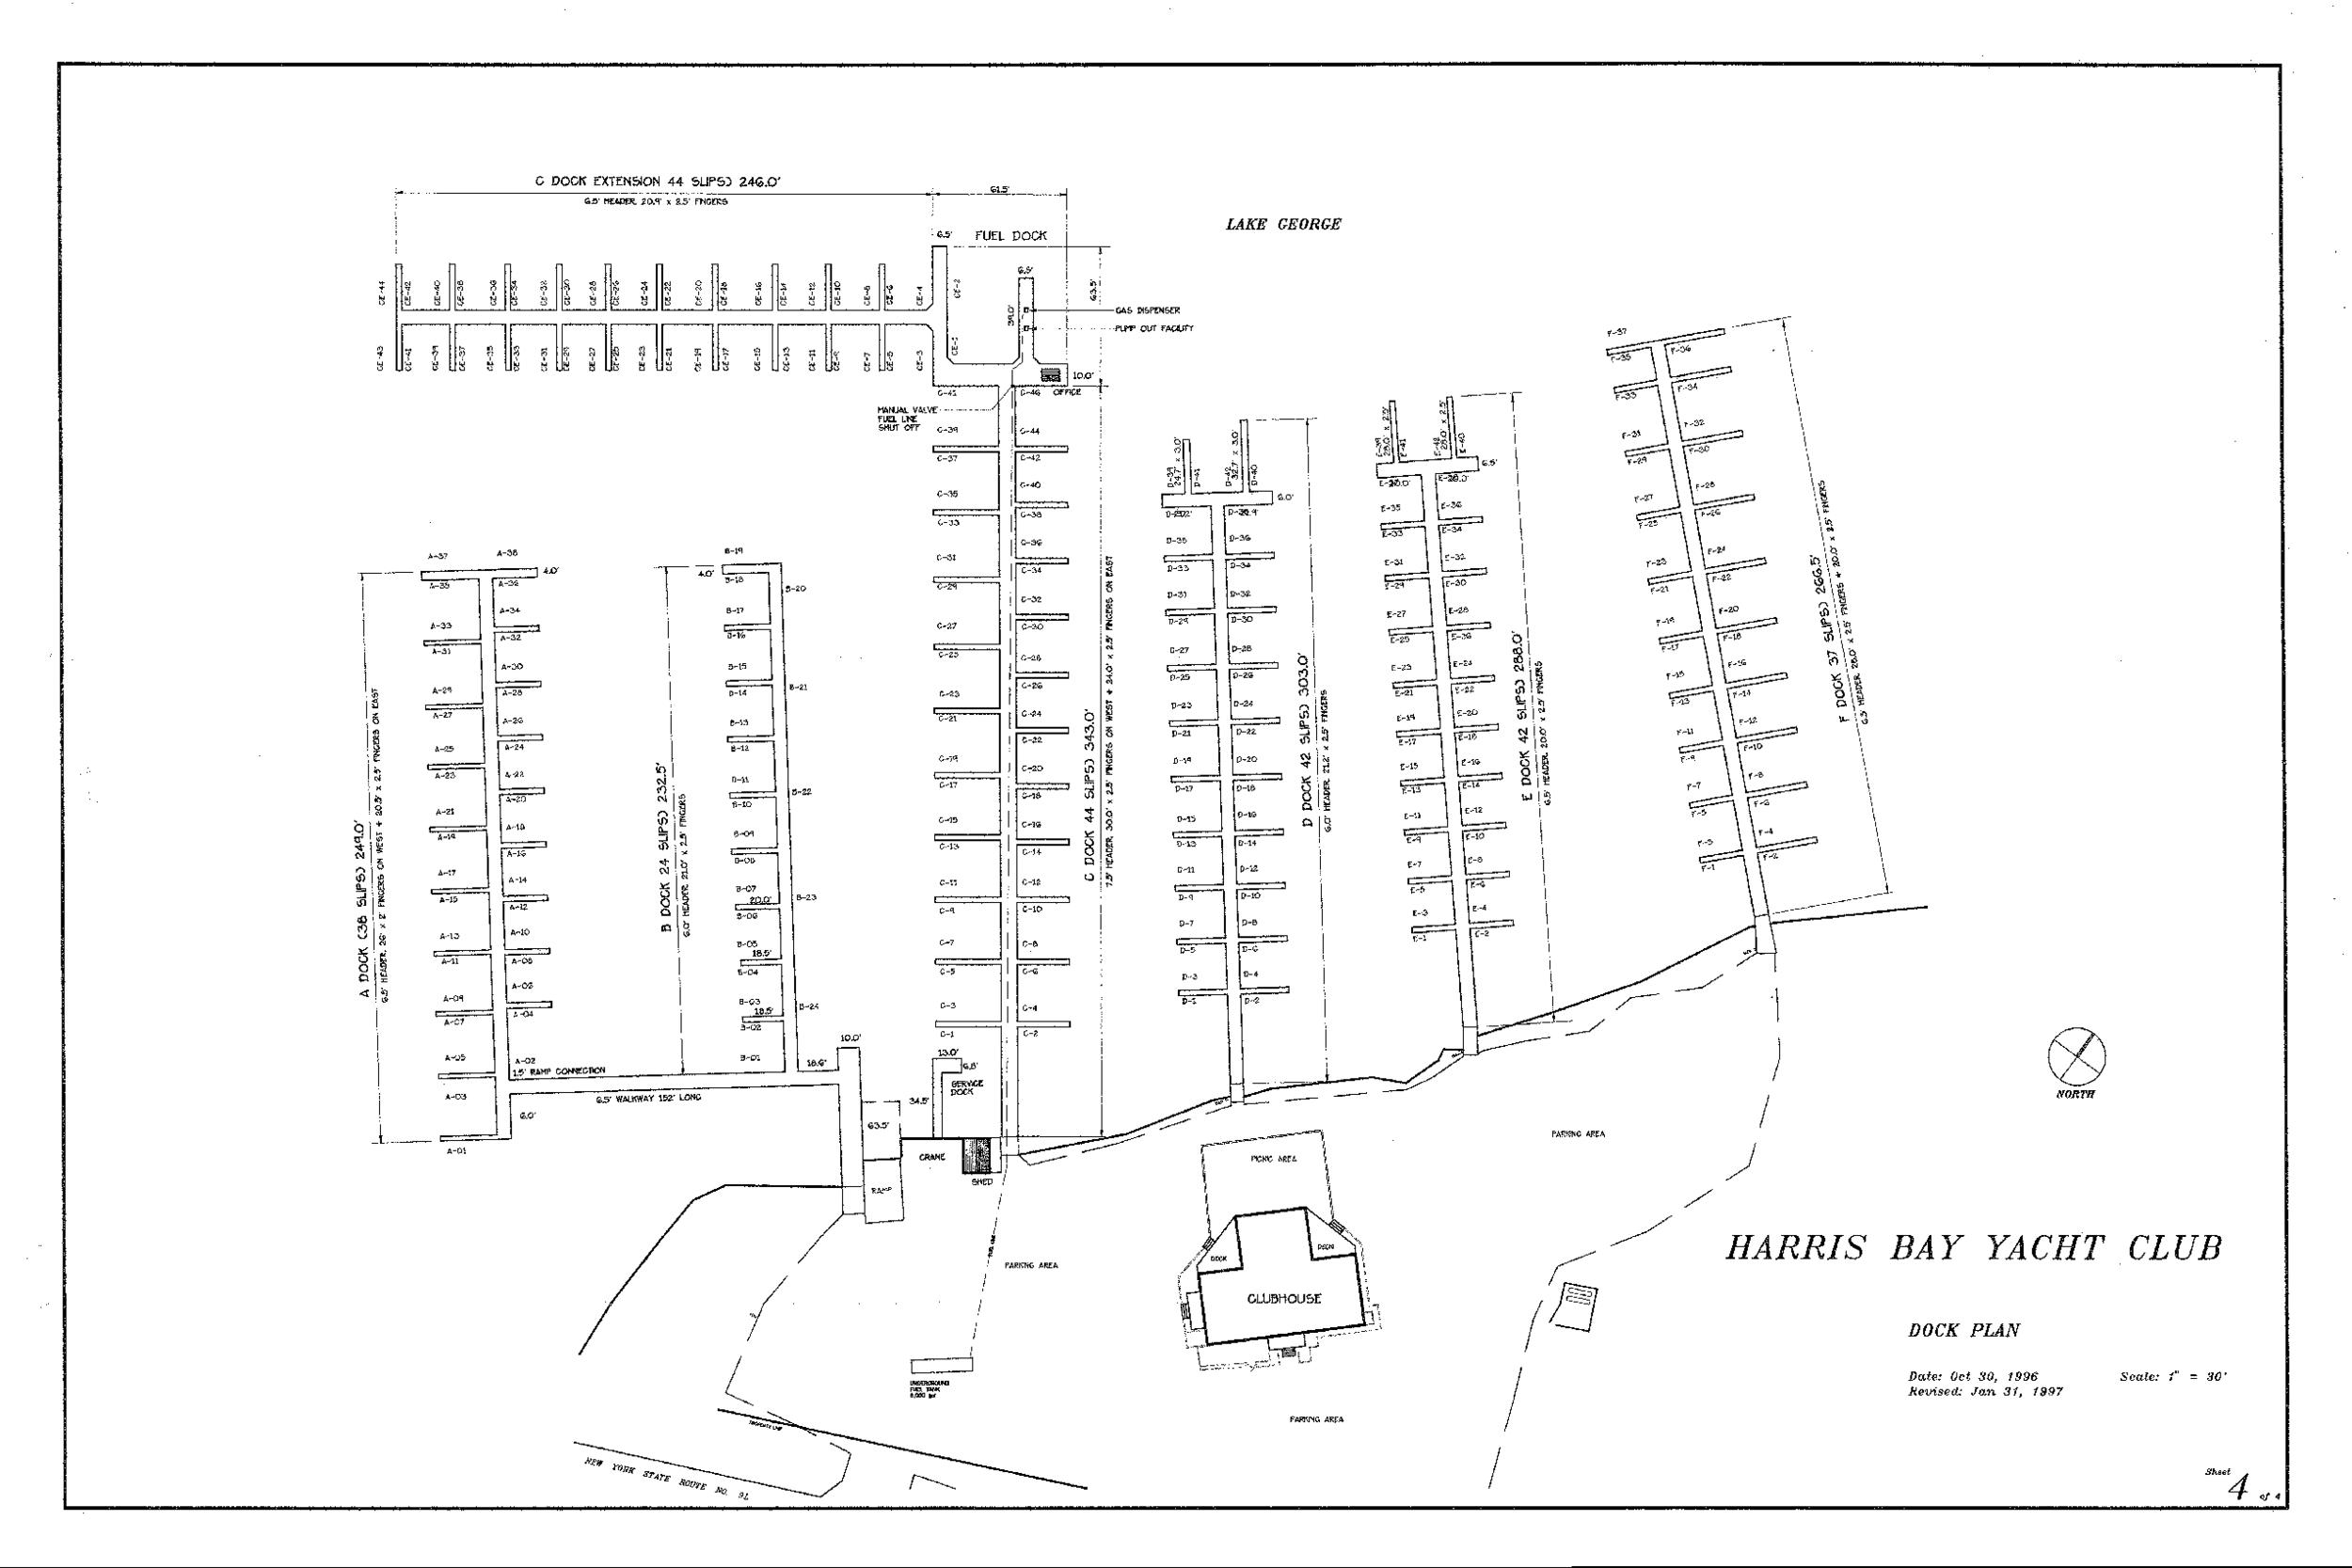 Harris Bay Yacht Club Dock Map